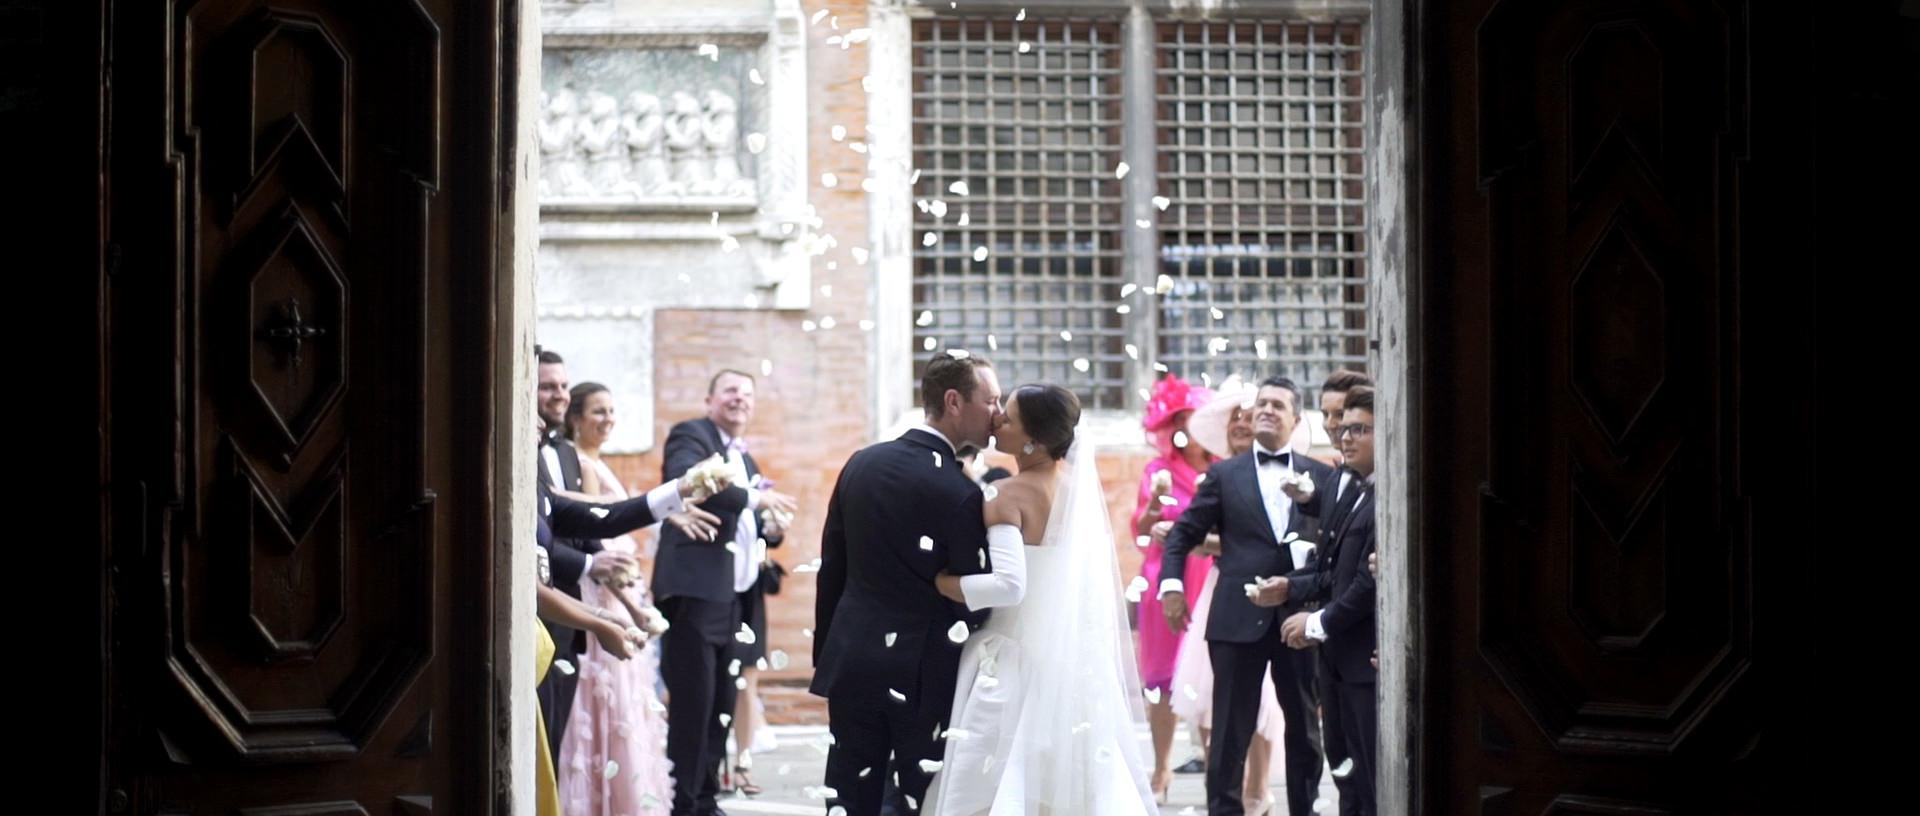 Wedding at San Giovanni Evangelista Venice